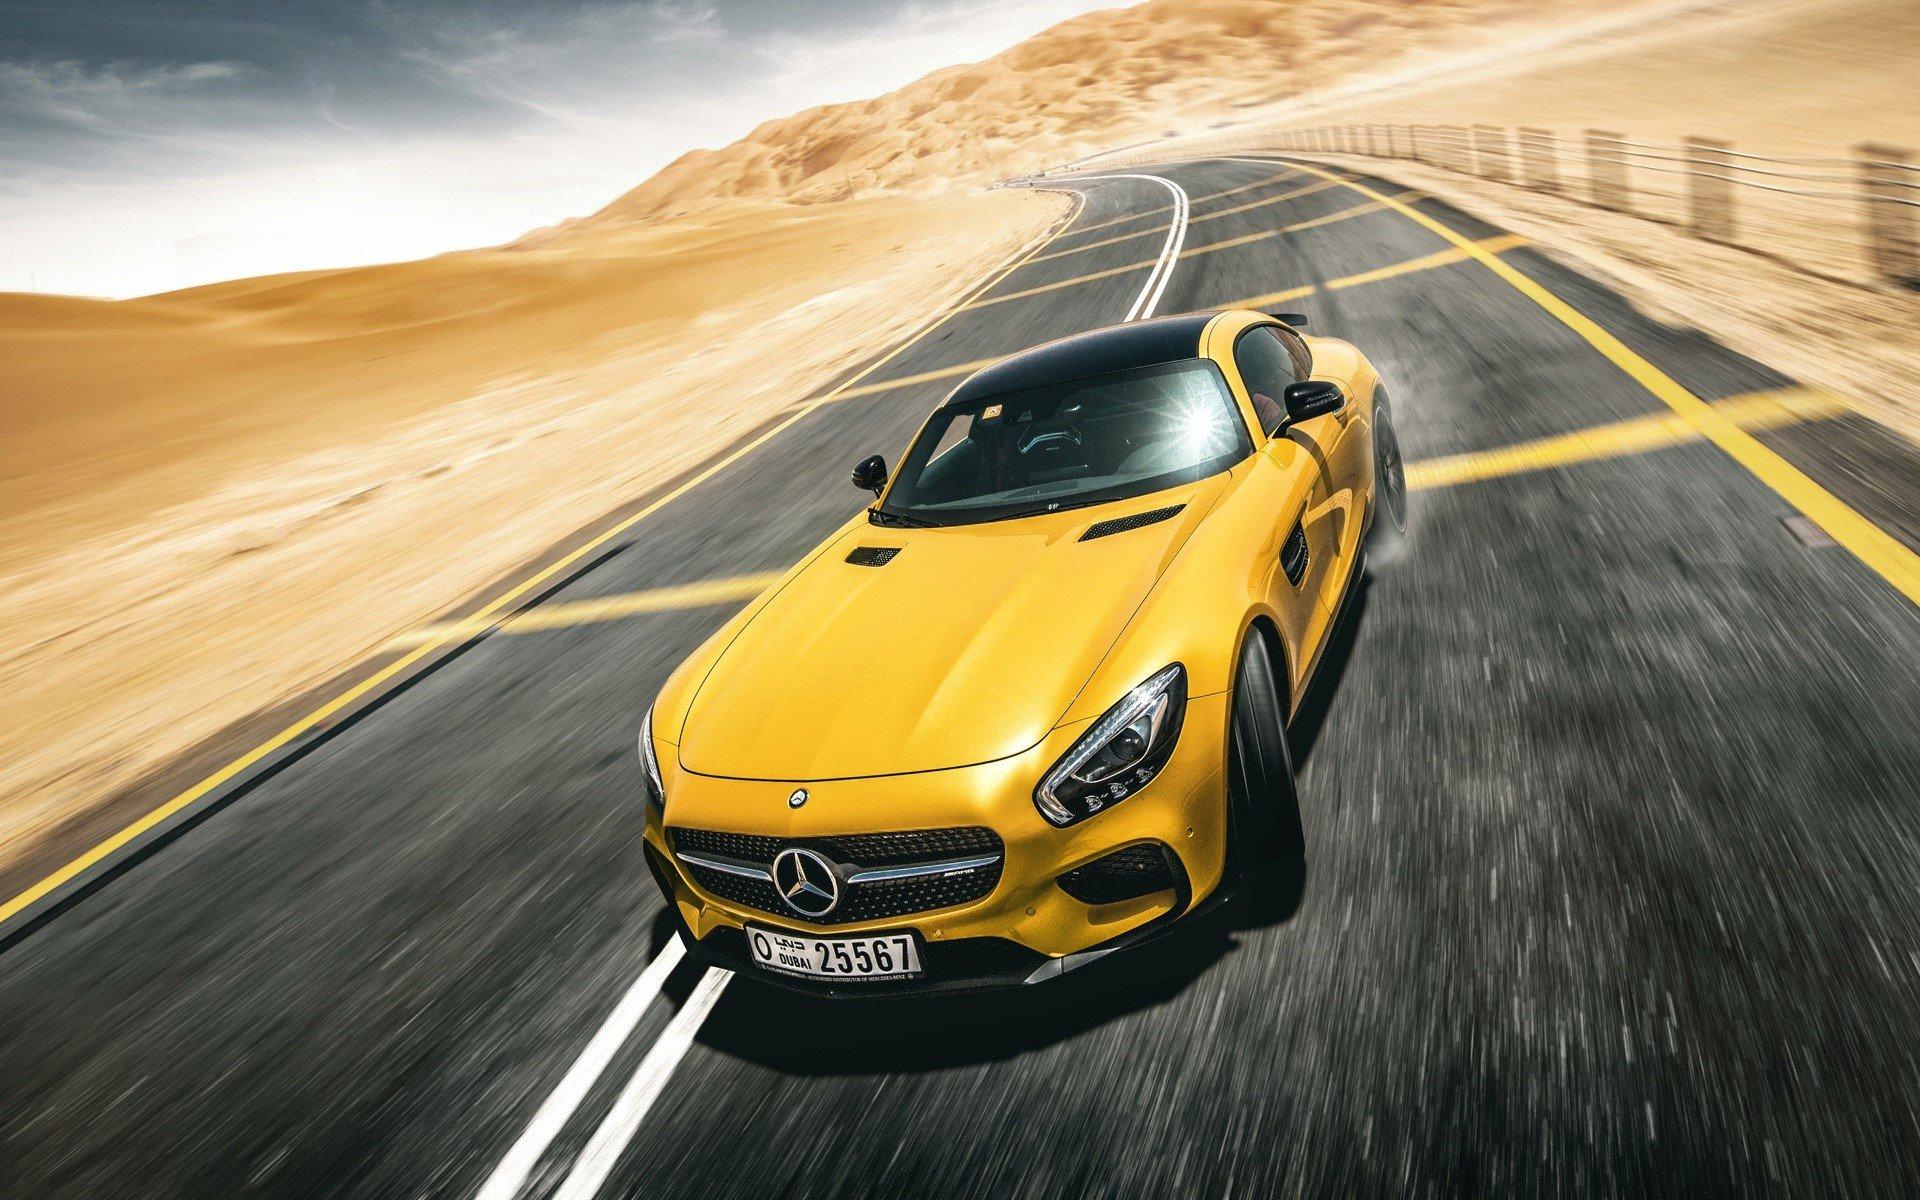 Wallpaper Mercedes Benz AMG GT S yellow